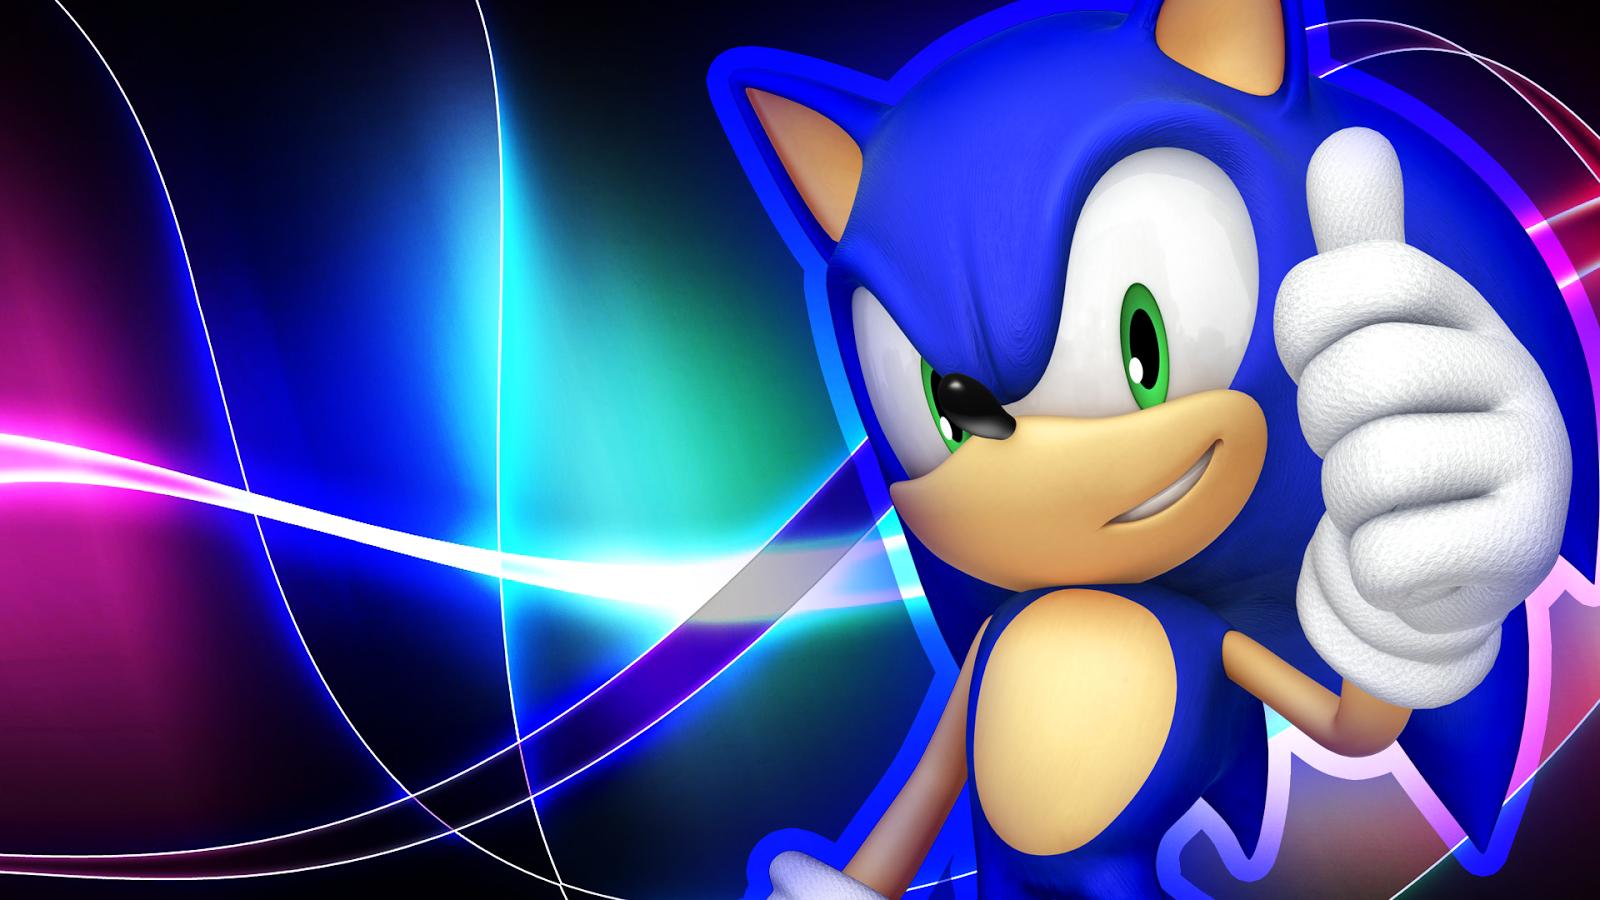 50 Sonic The Hedgehog Wallpapers On Wallpapersafari